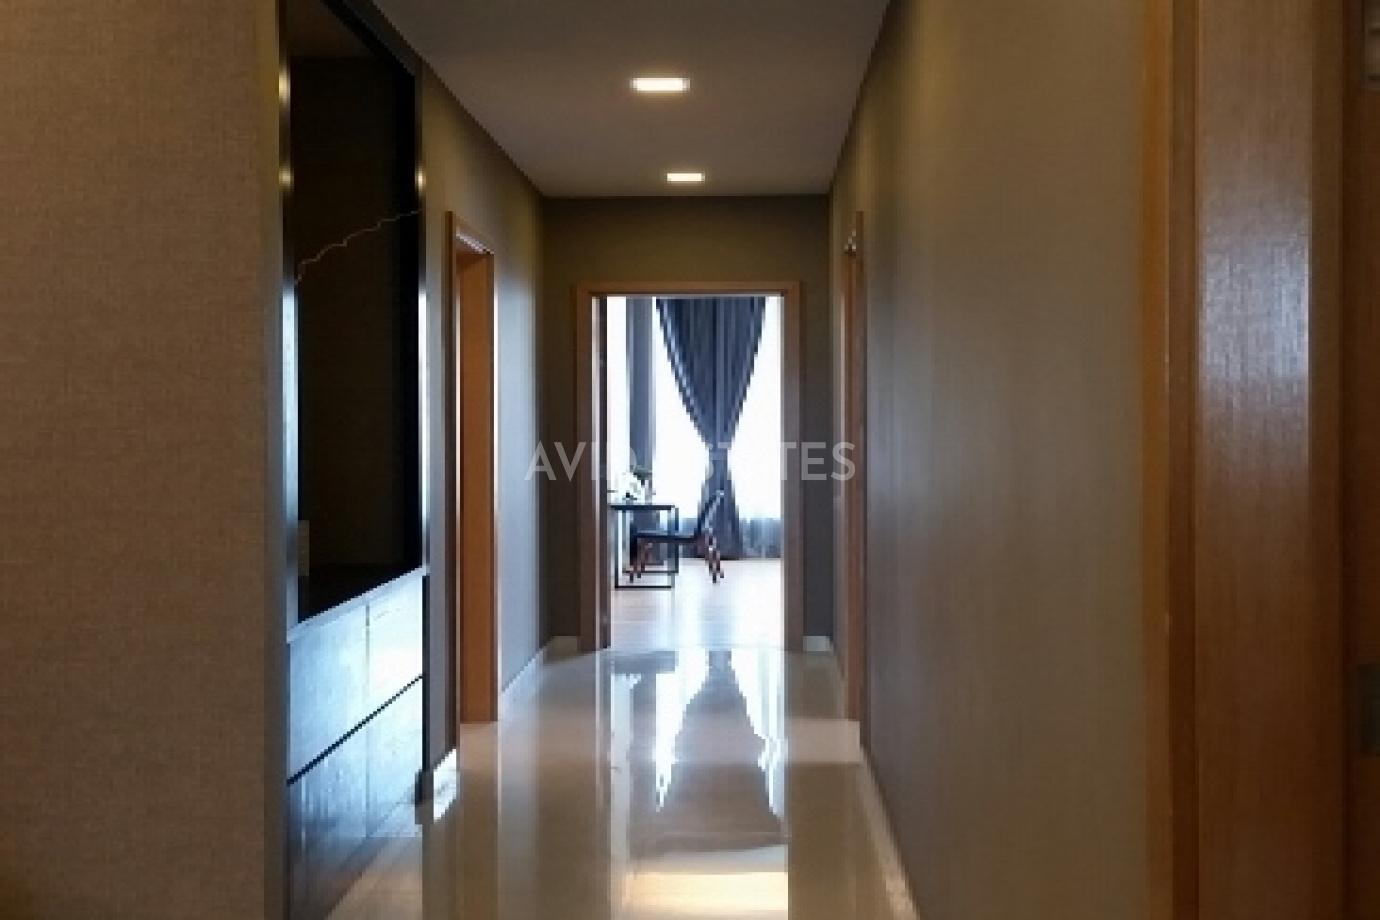 Verticas Residensi,Kuala Lumpur, 5 Bedrooms Bedrooms, ,6 BathroomsBathrooms,Condominium / Serviced Residence,For Sale,Jalan Ceylon,1164